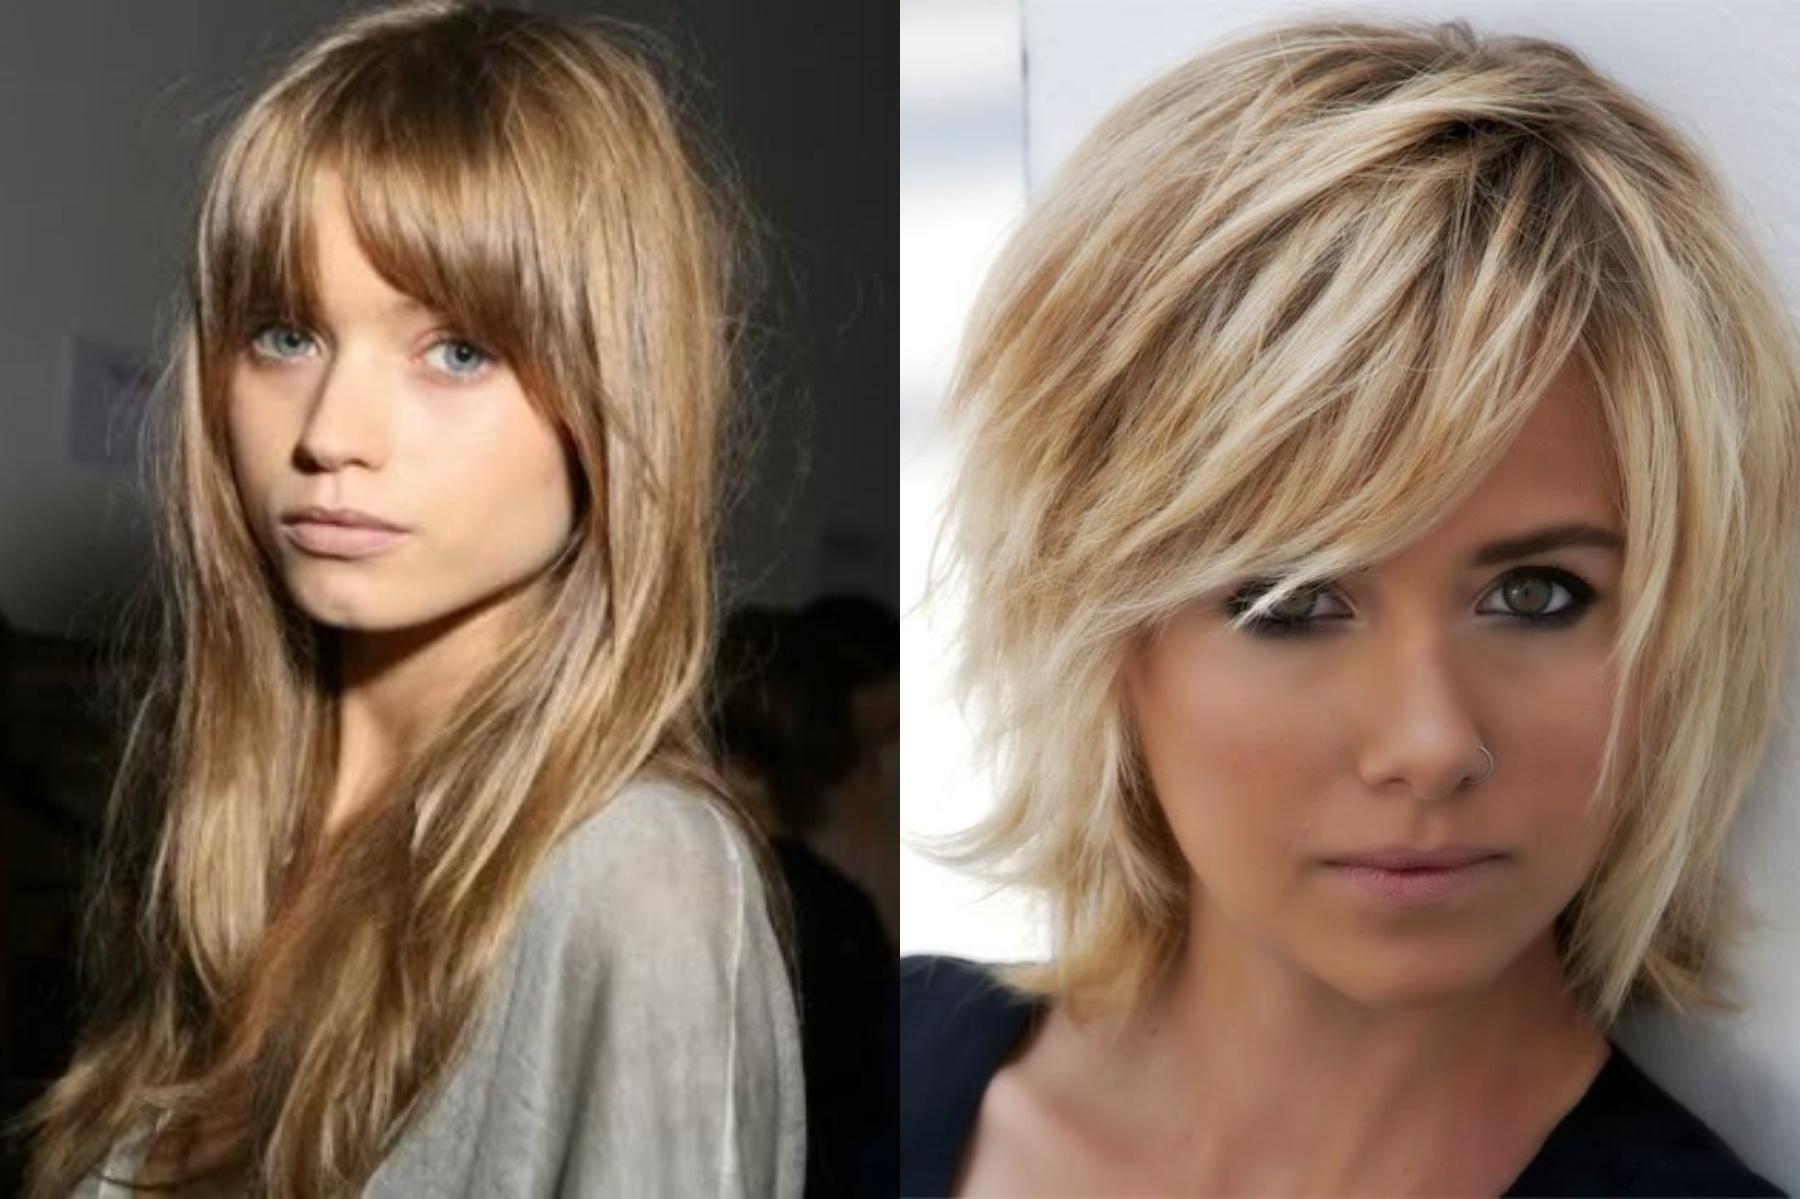 2018 Long Bangs Hairstyles For Women's - Haircuts Bangs 4